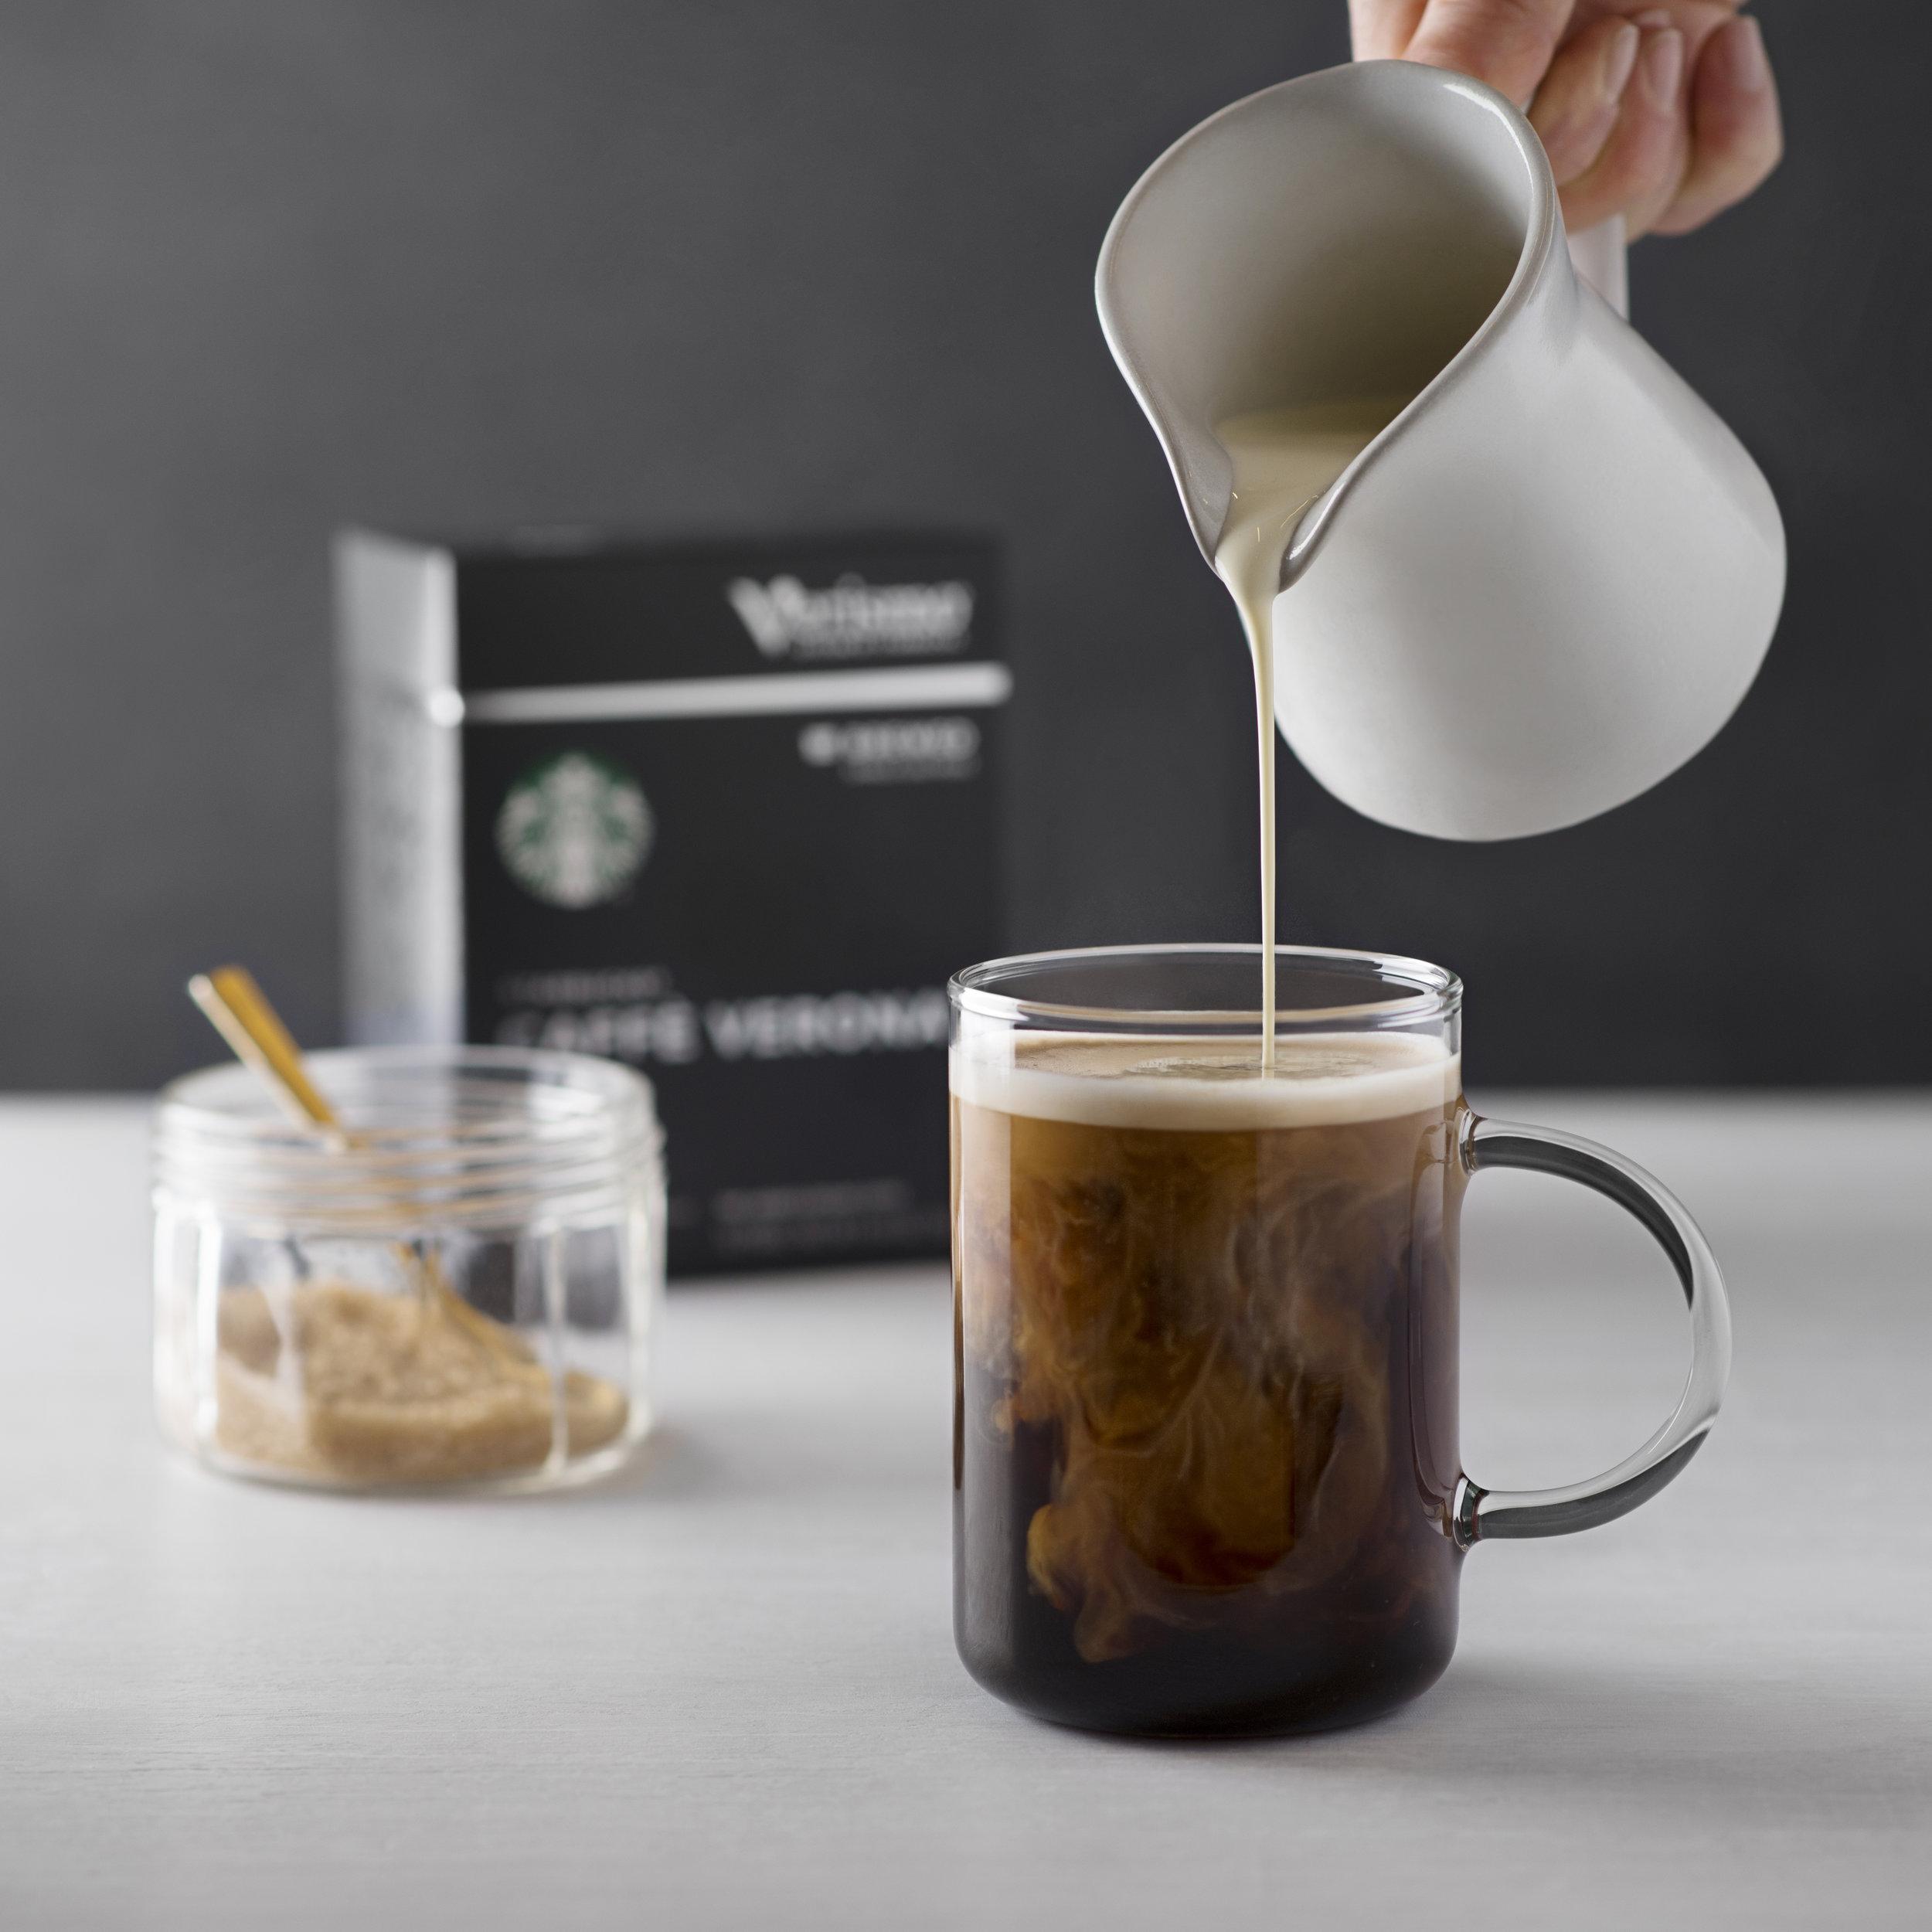 Starbucks-Verismo-Product-1658-1x1.jpg